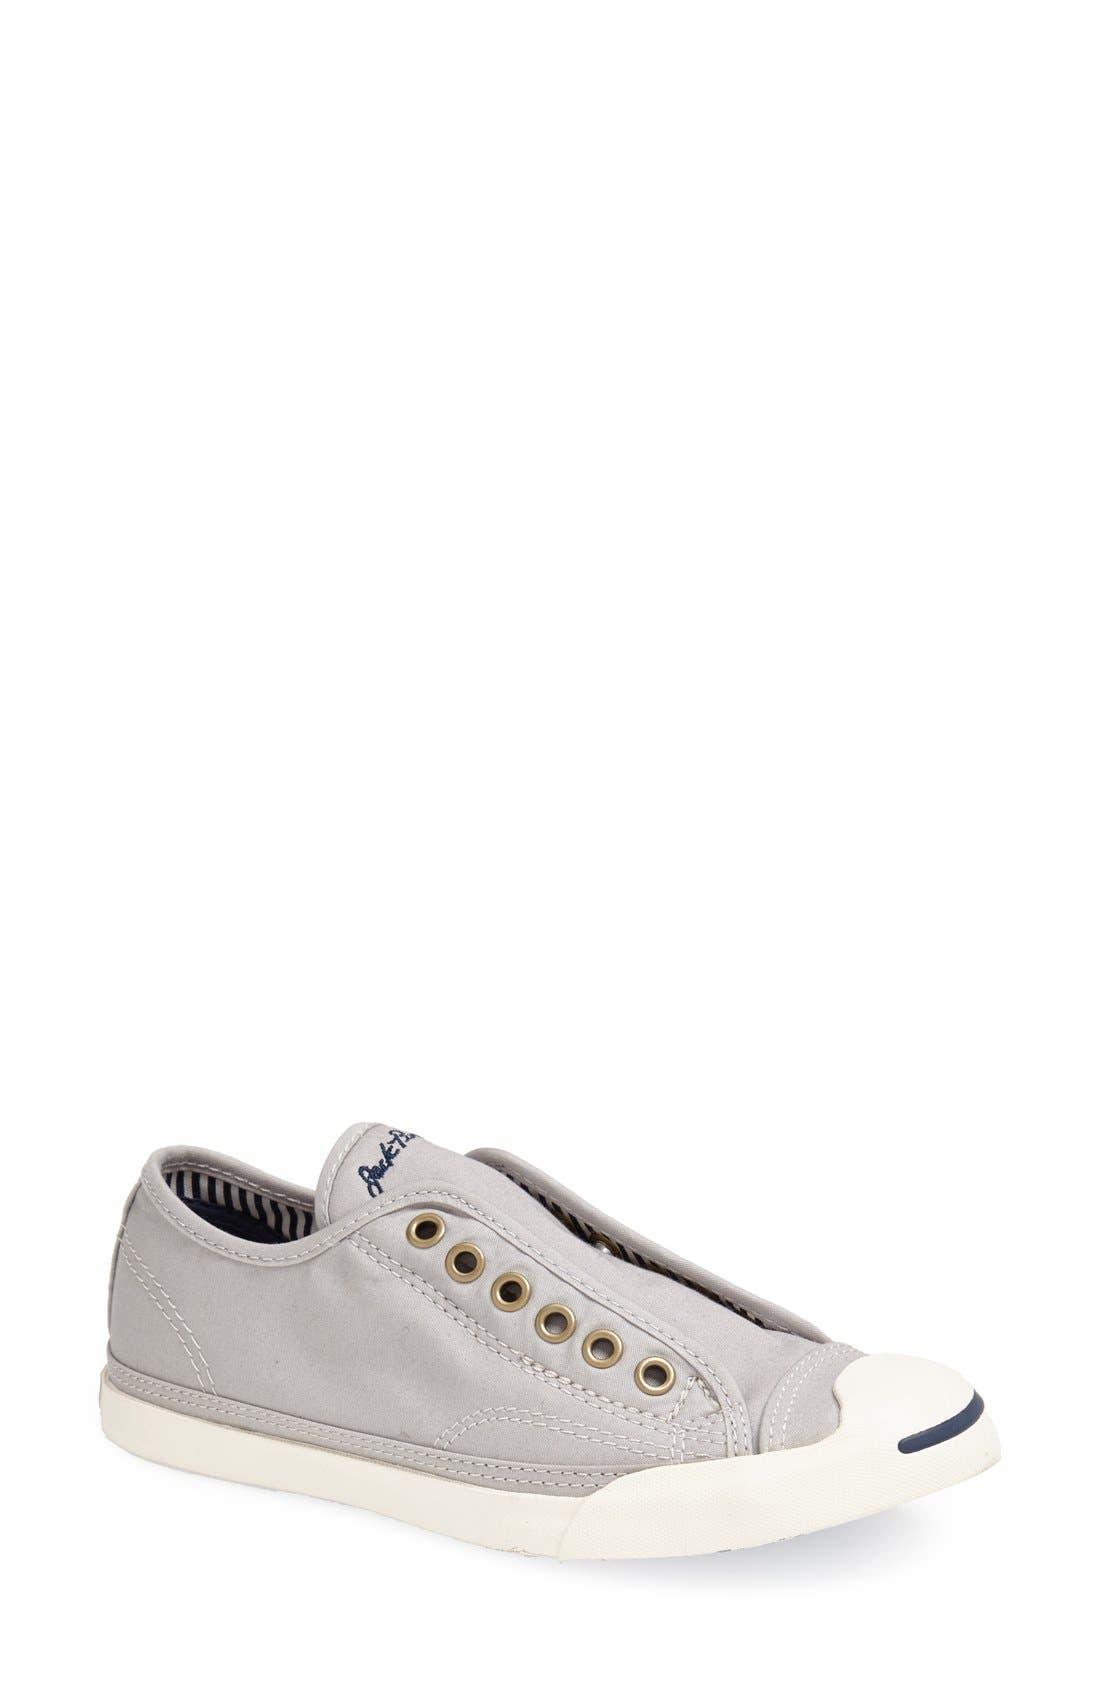 Alternate Image 1 Selected - Converse 'Jack Purcell LP' Sneaker (Women)